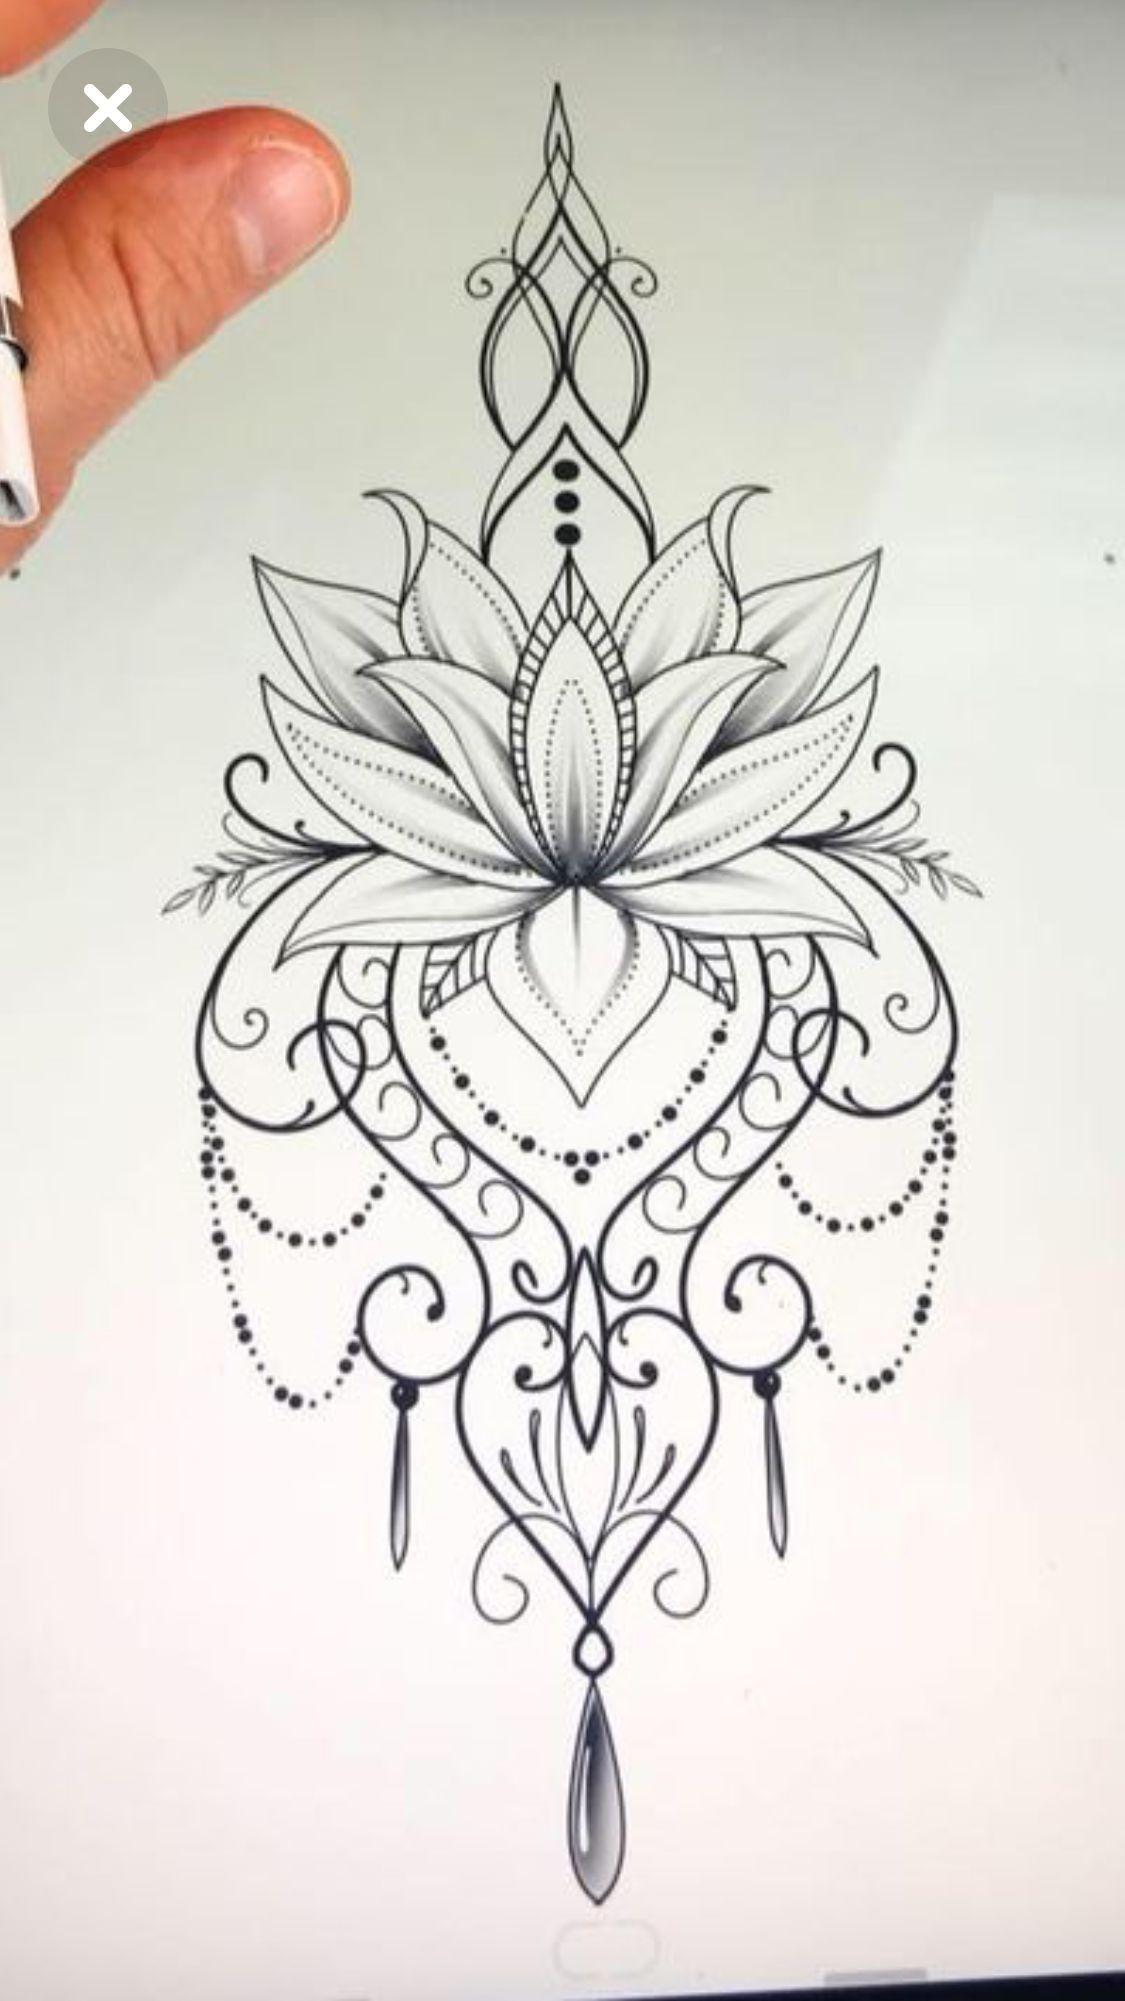 I Like The Lotus By Itself Flower Tattoo Designs Mandala Tattoo Design Tattoos